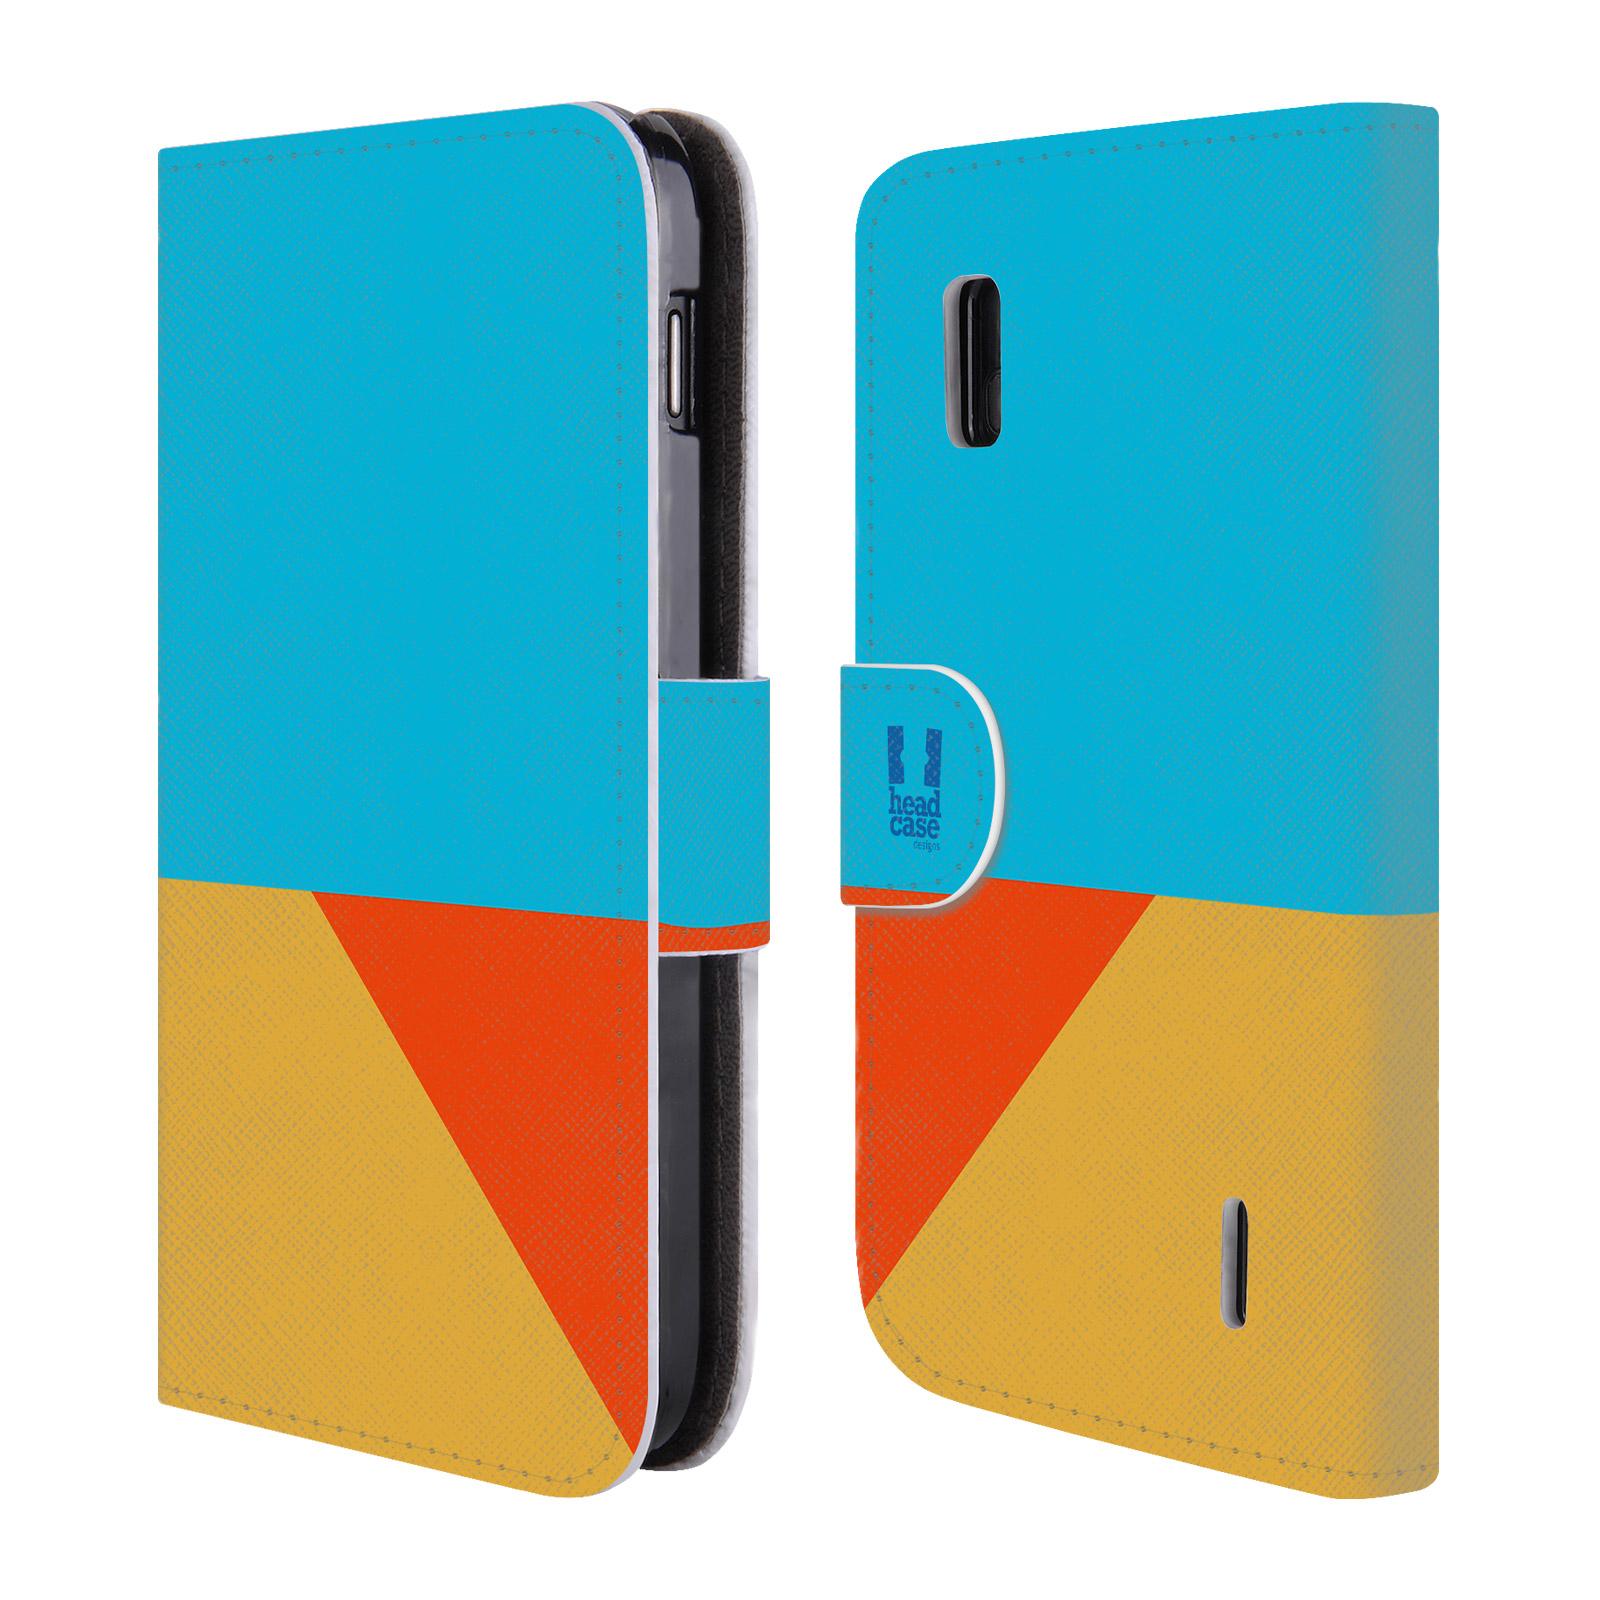 HEAD CASE Flipové pouzdro pro mobil LG NEXUS 4 barevné tvary béžová a modrá DAY WEAR